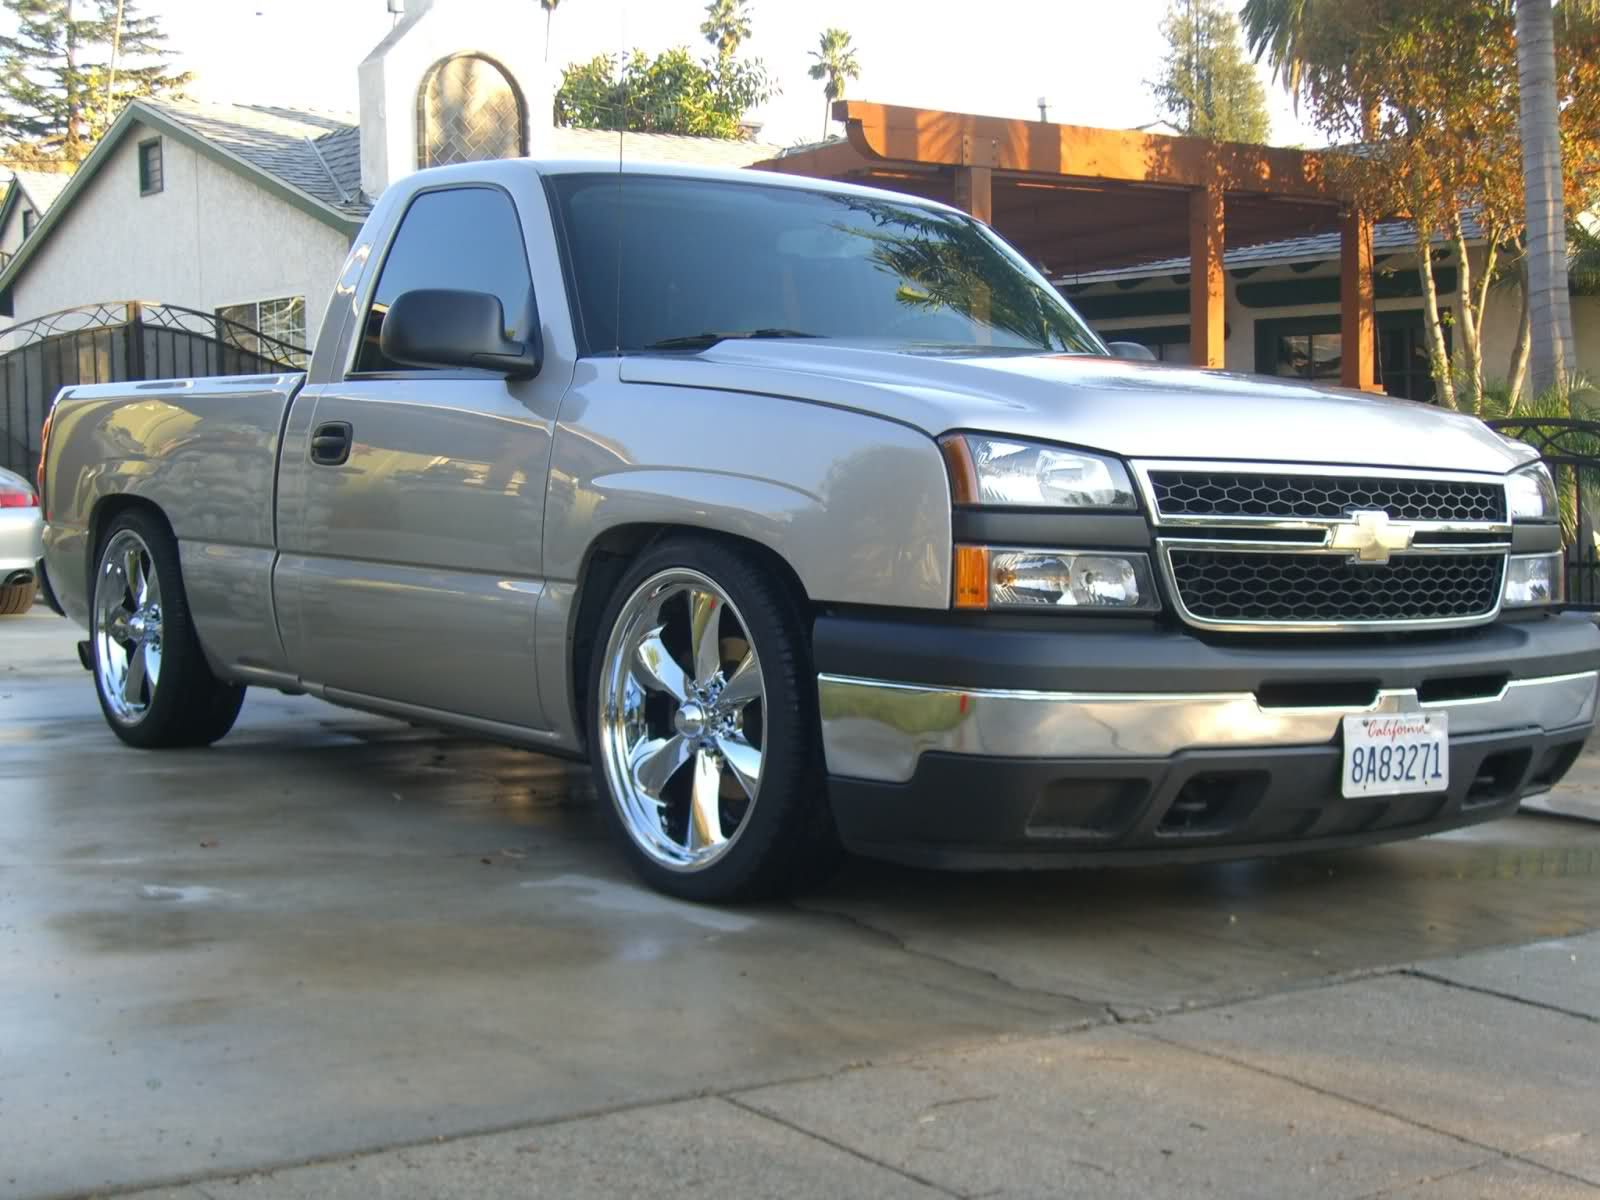 medium resolution of ca 2006 rcsb silverado lowered 4 6 chevy truck forum gmc truck forum gmfullsize com